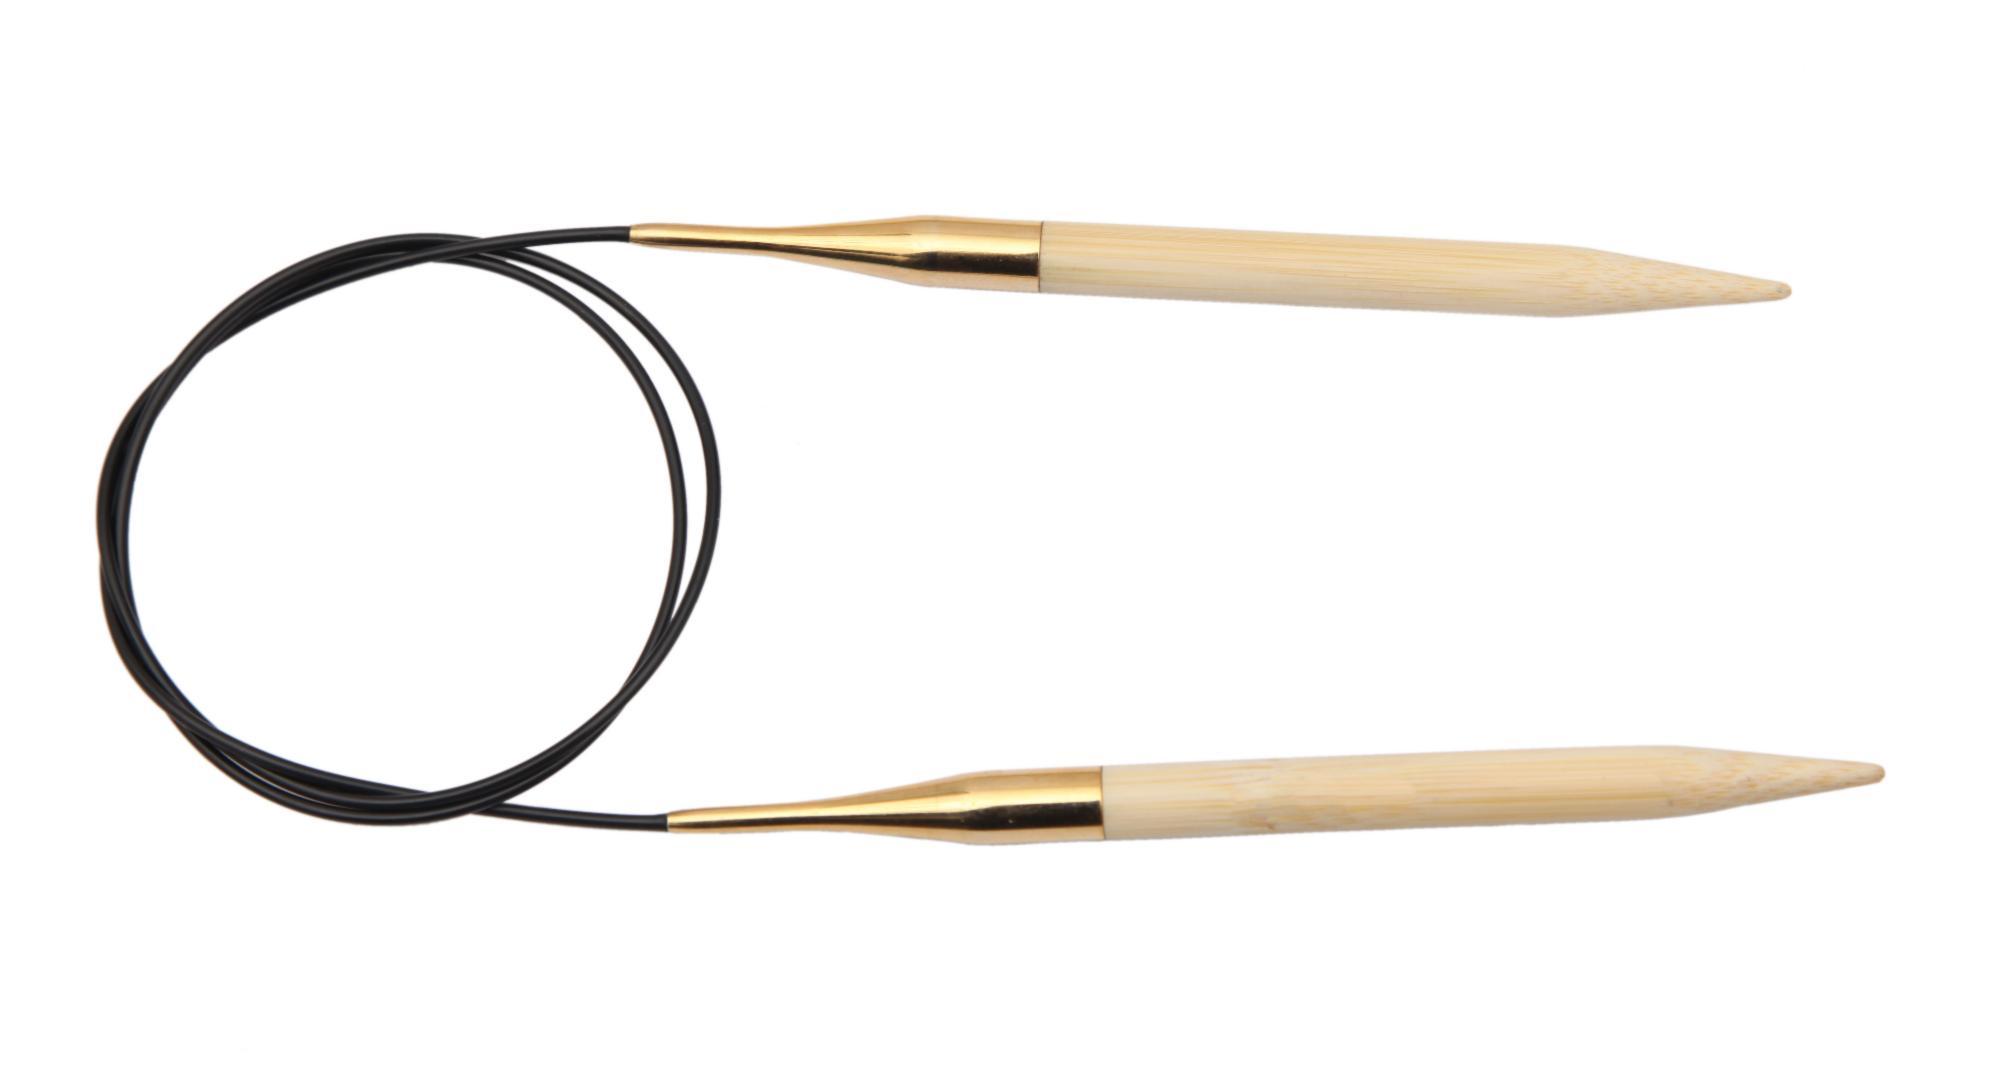 Спицы круговые 100 см Bamboo KnitPro, 22273, 7.00 мм